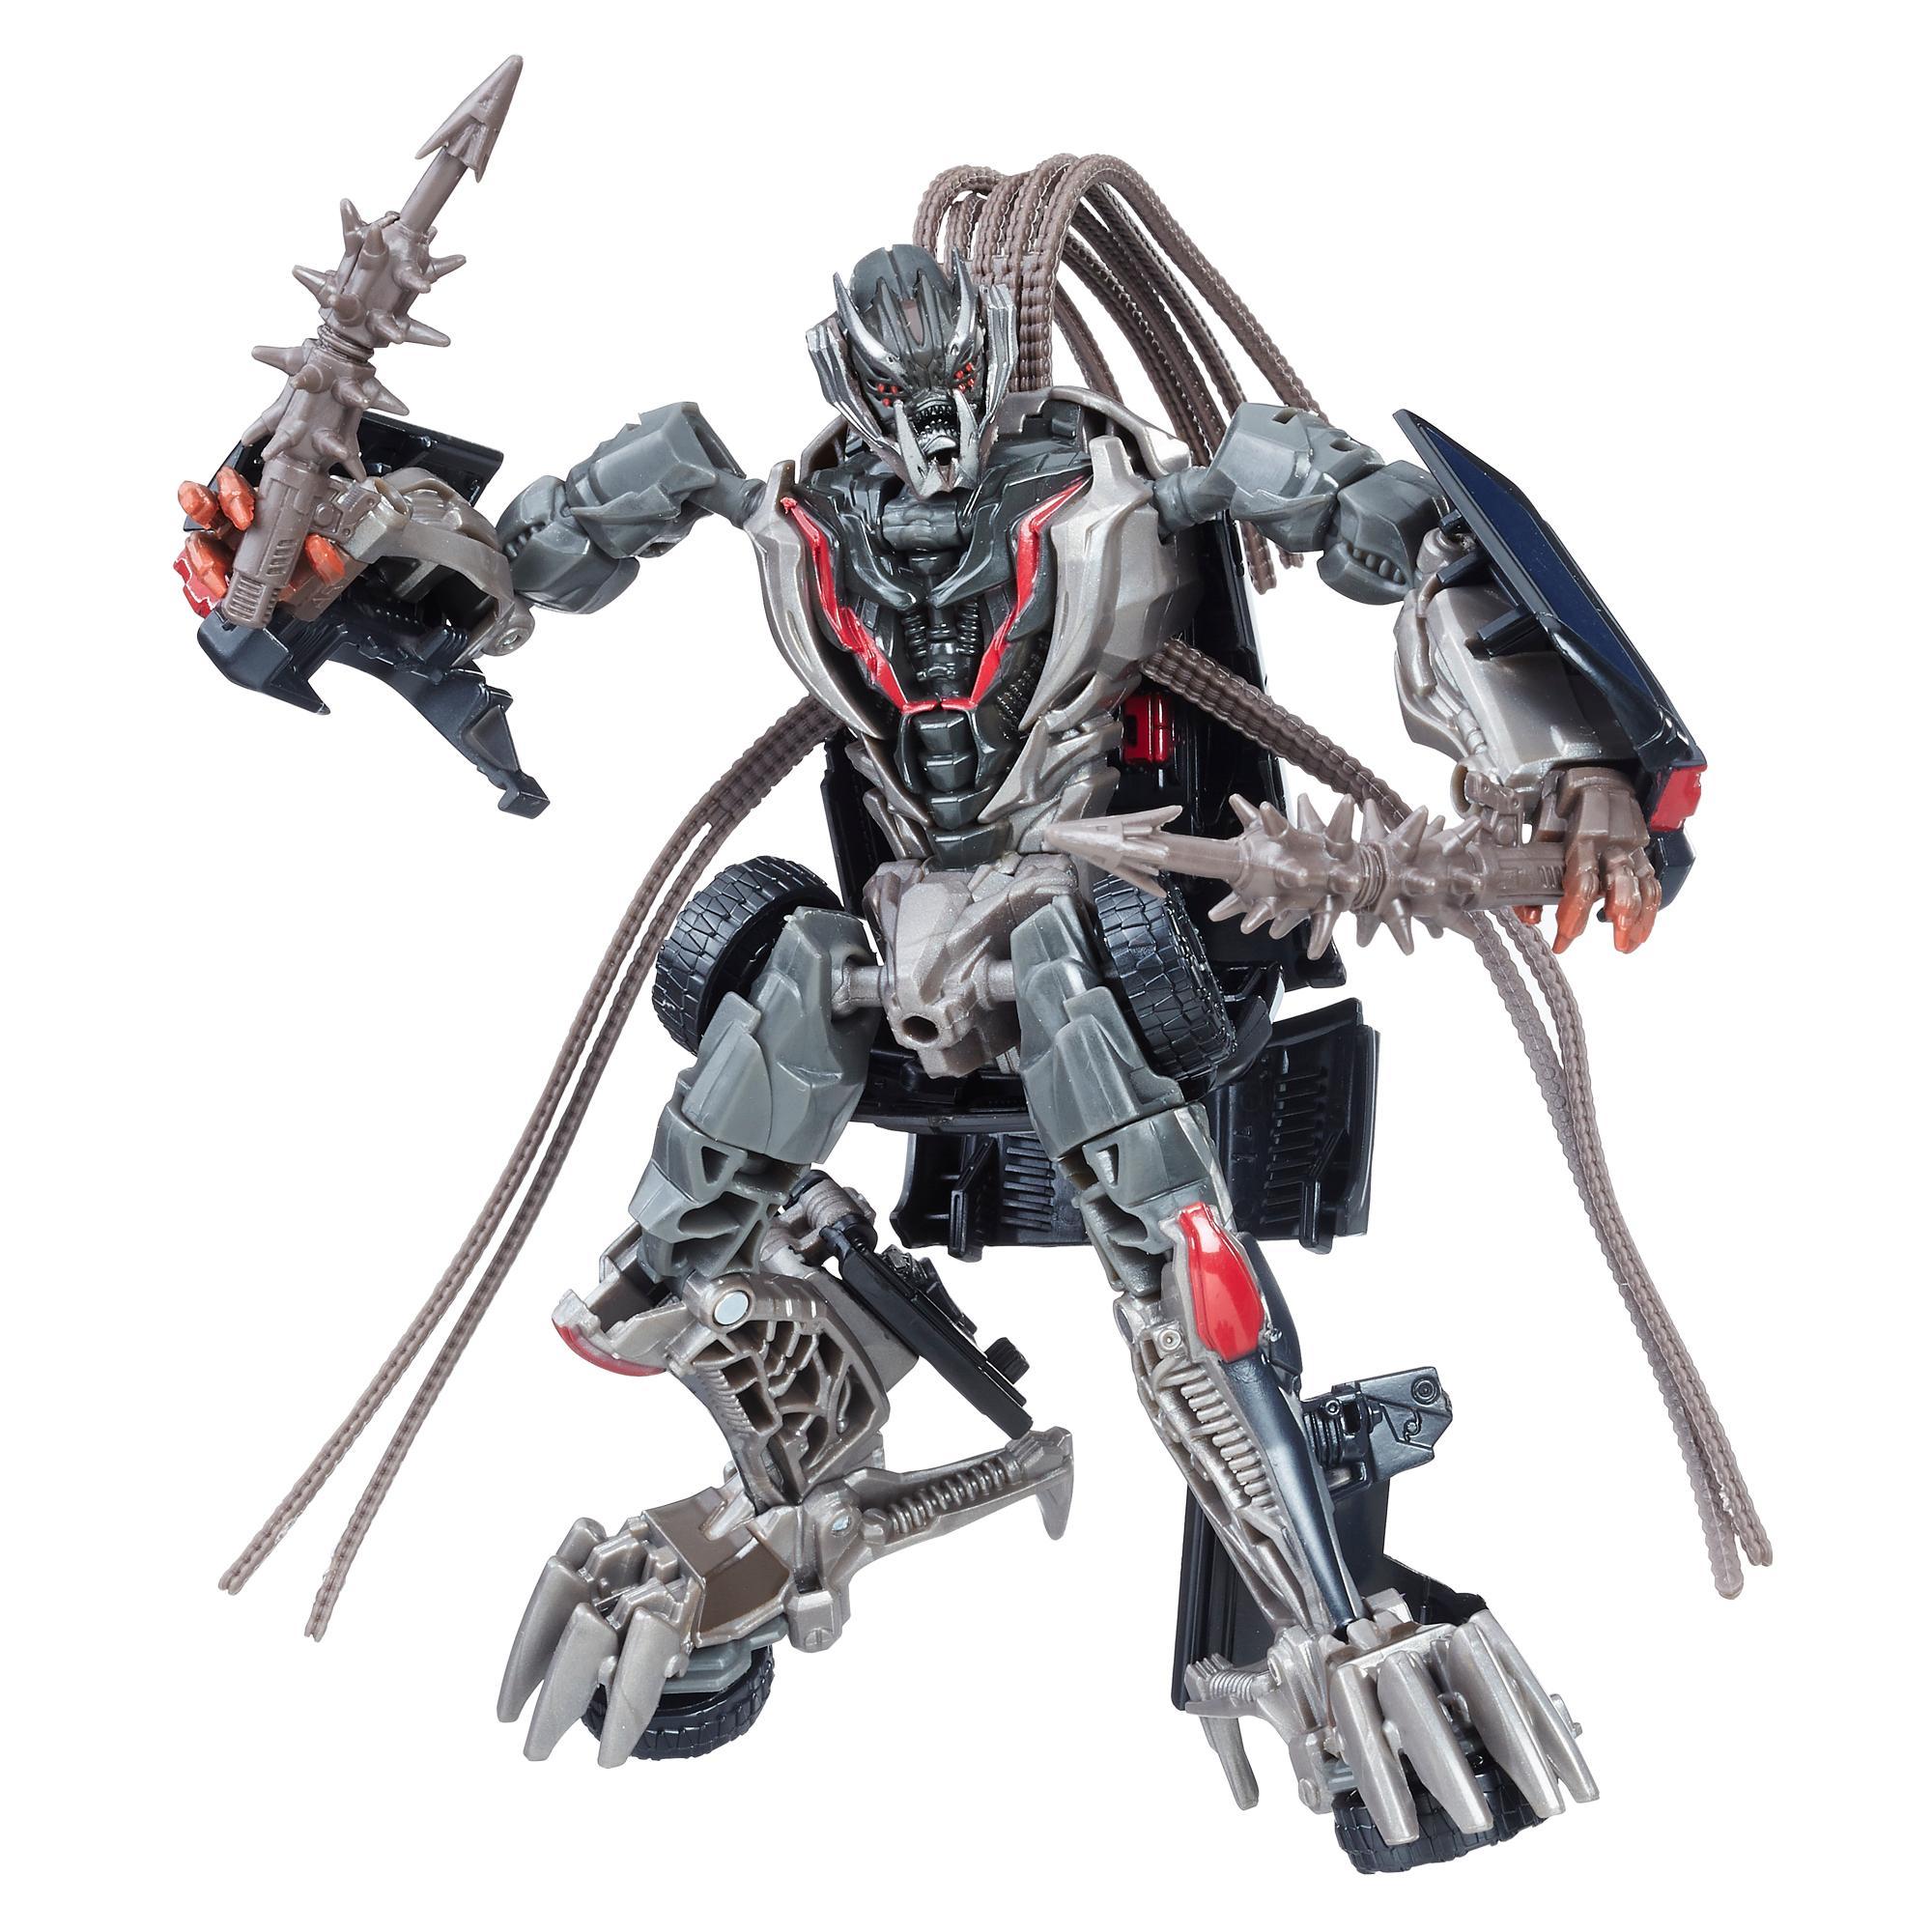 Transformers Filmleri Serisi Figür - Crowbar